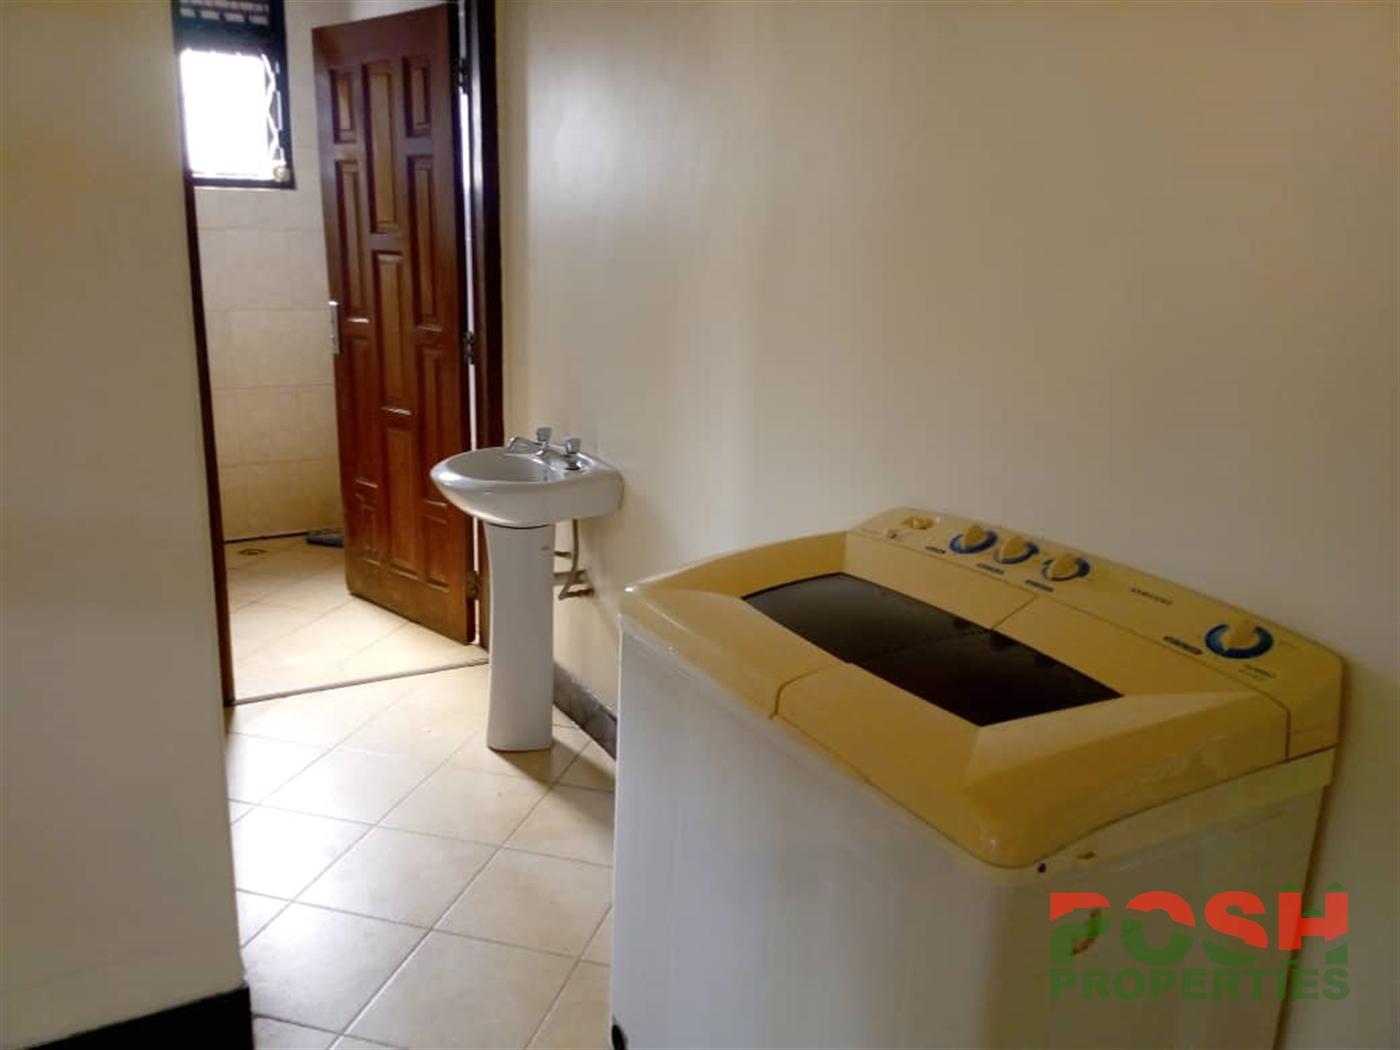 Mansion for sale in Ntinda Kampala